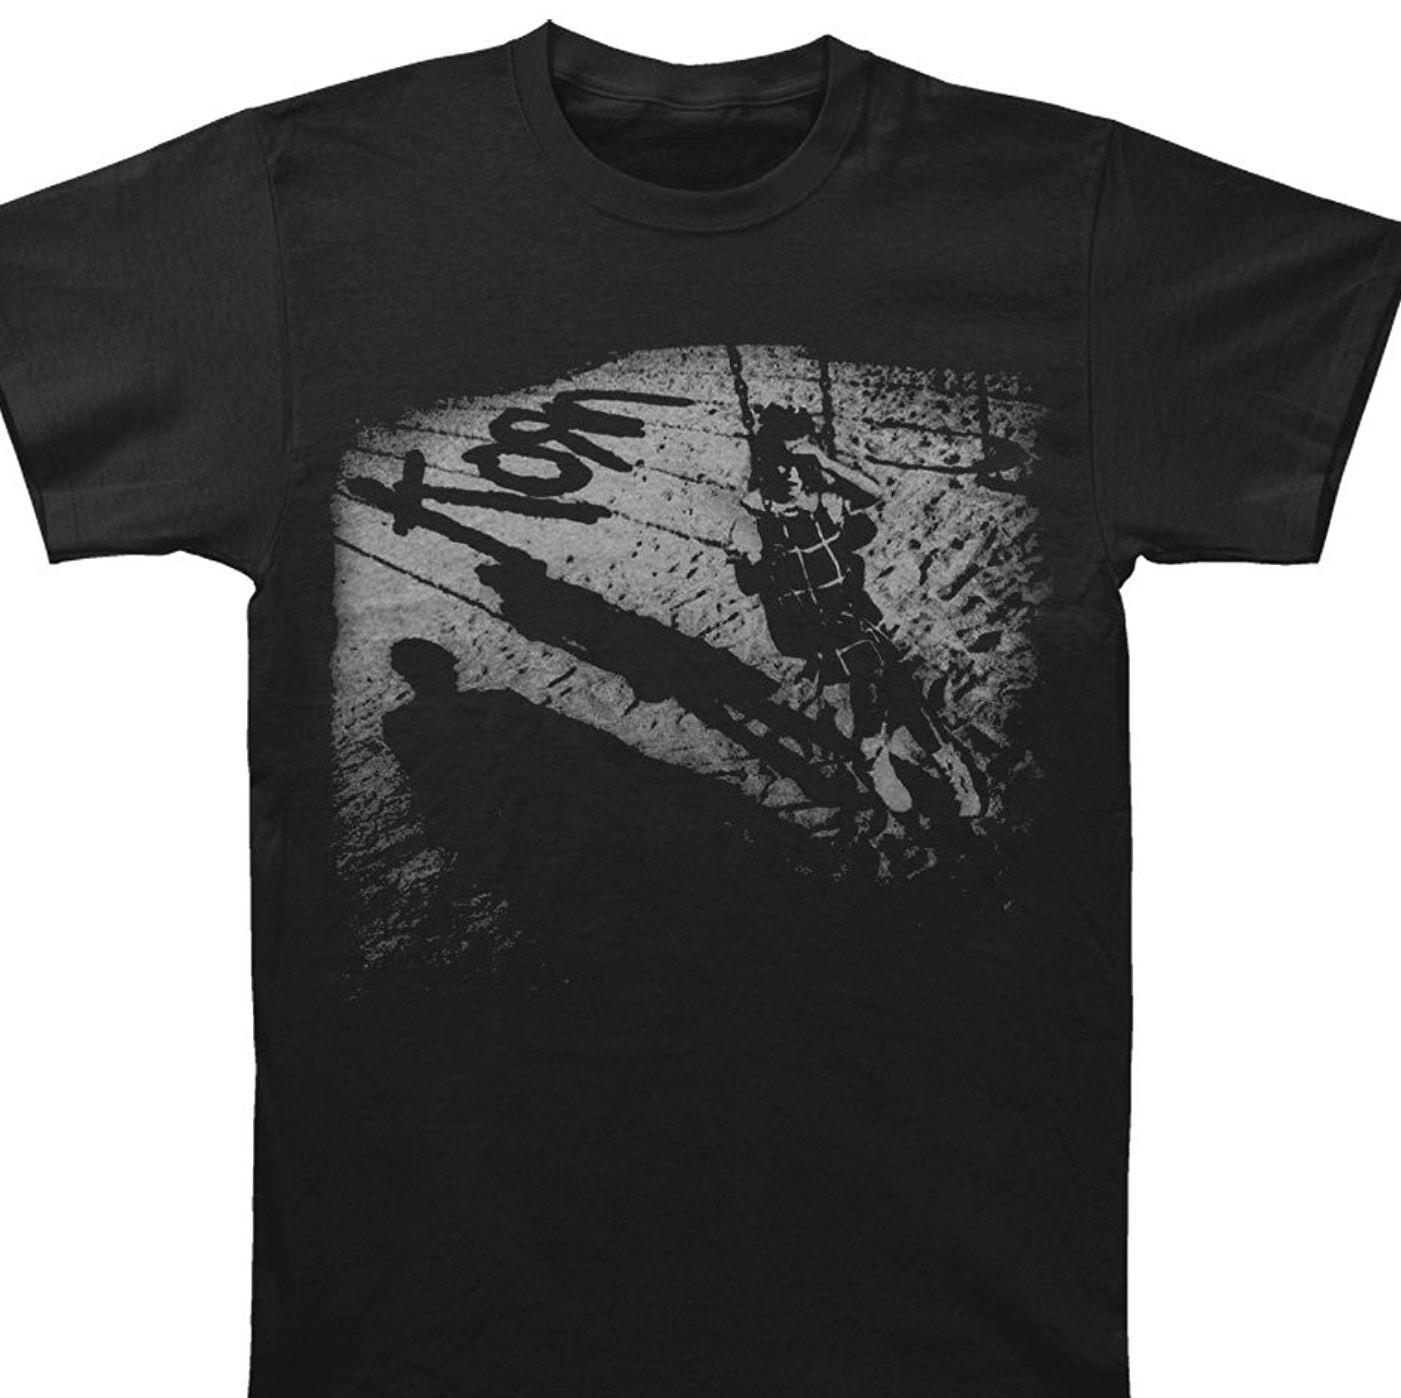 Tee Shirt Hipster Harajuku Brand Clothing T Shirt Korn Men'S Sandbox Tee T Shirt Black